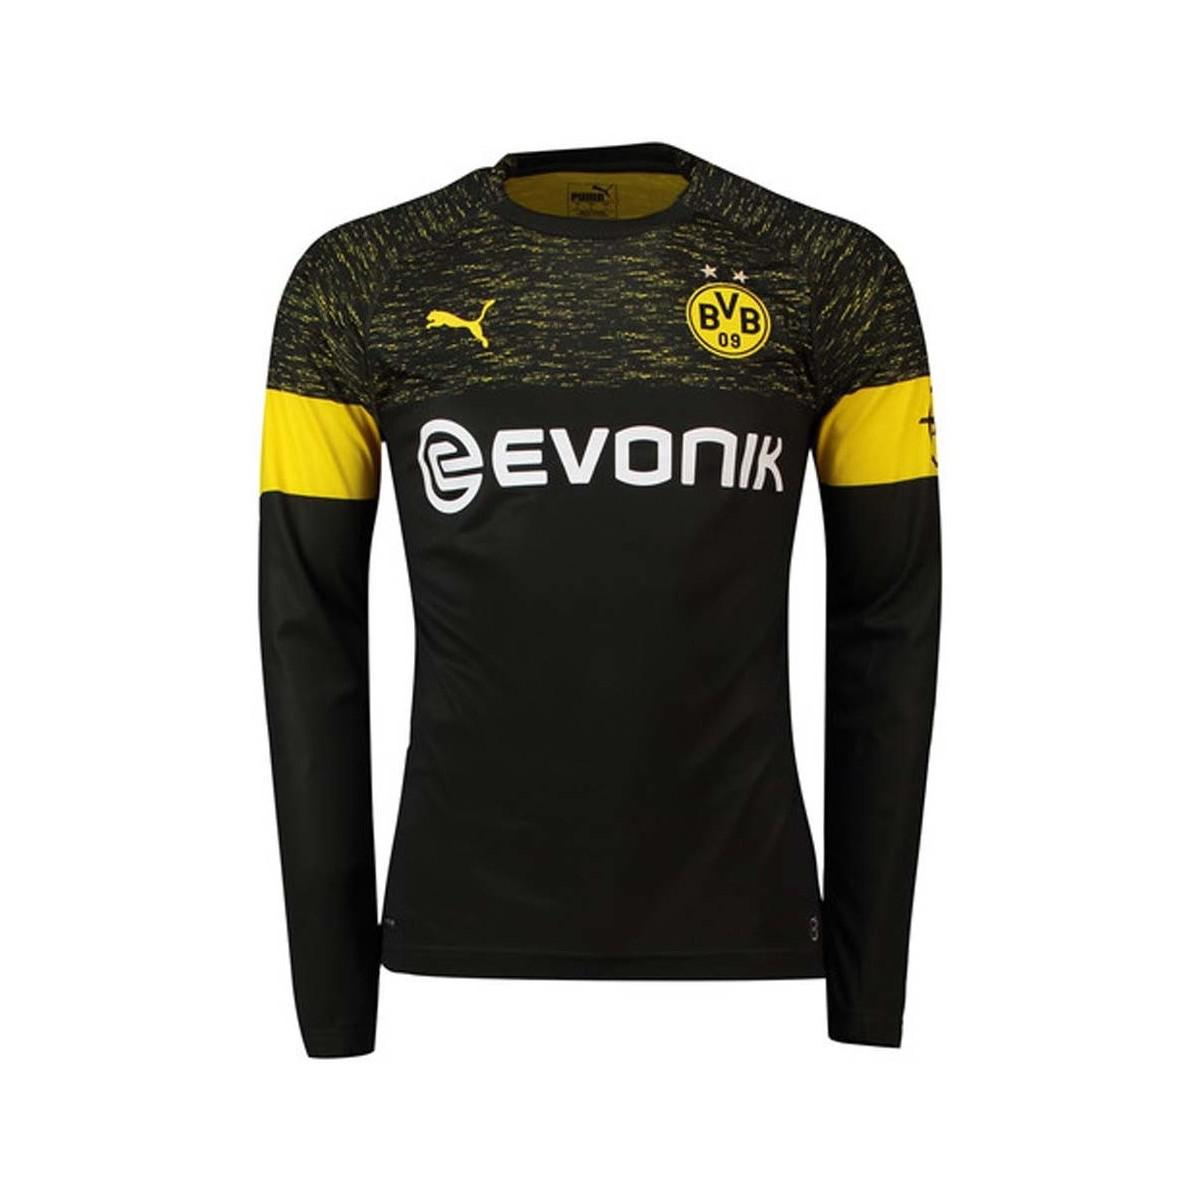 8b3b6ac5cfde7 PUMA 2018-2019 Borussia Dortmund Away Long Sleeve Shirt Men's In Black for  men